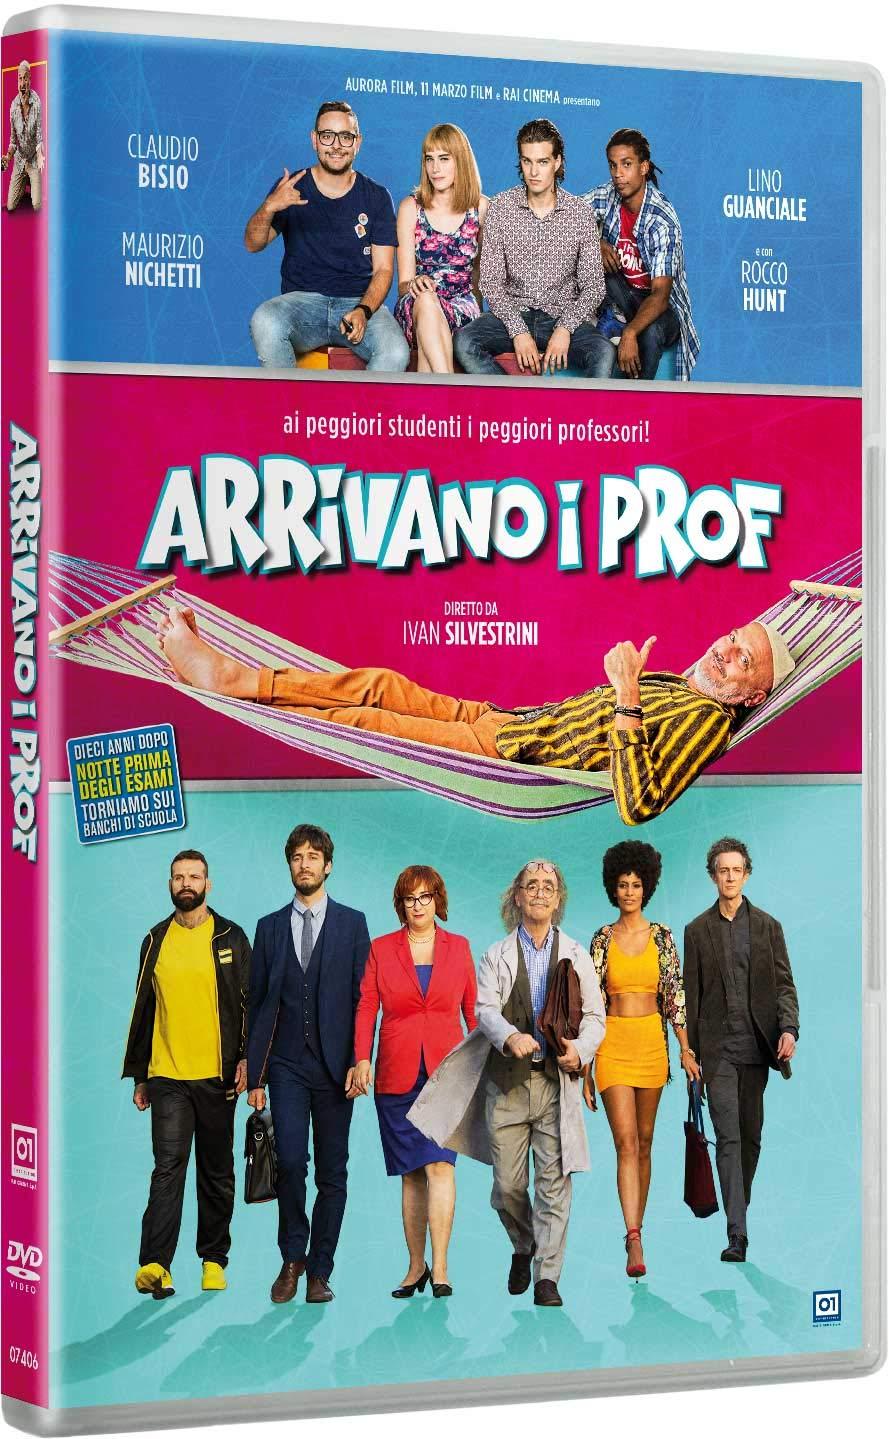 ARRIVANO I PROF (DVD)